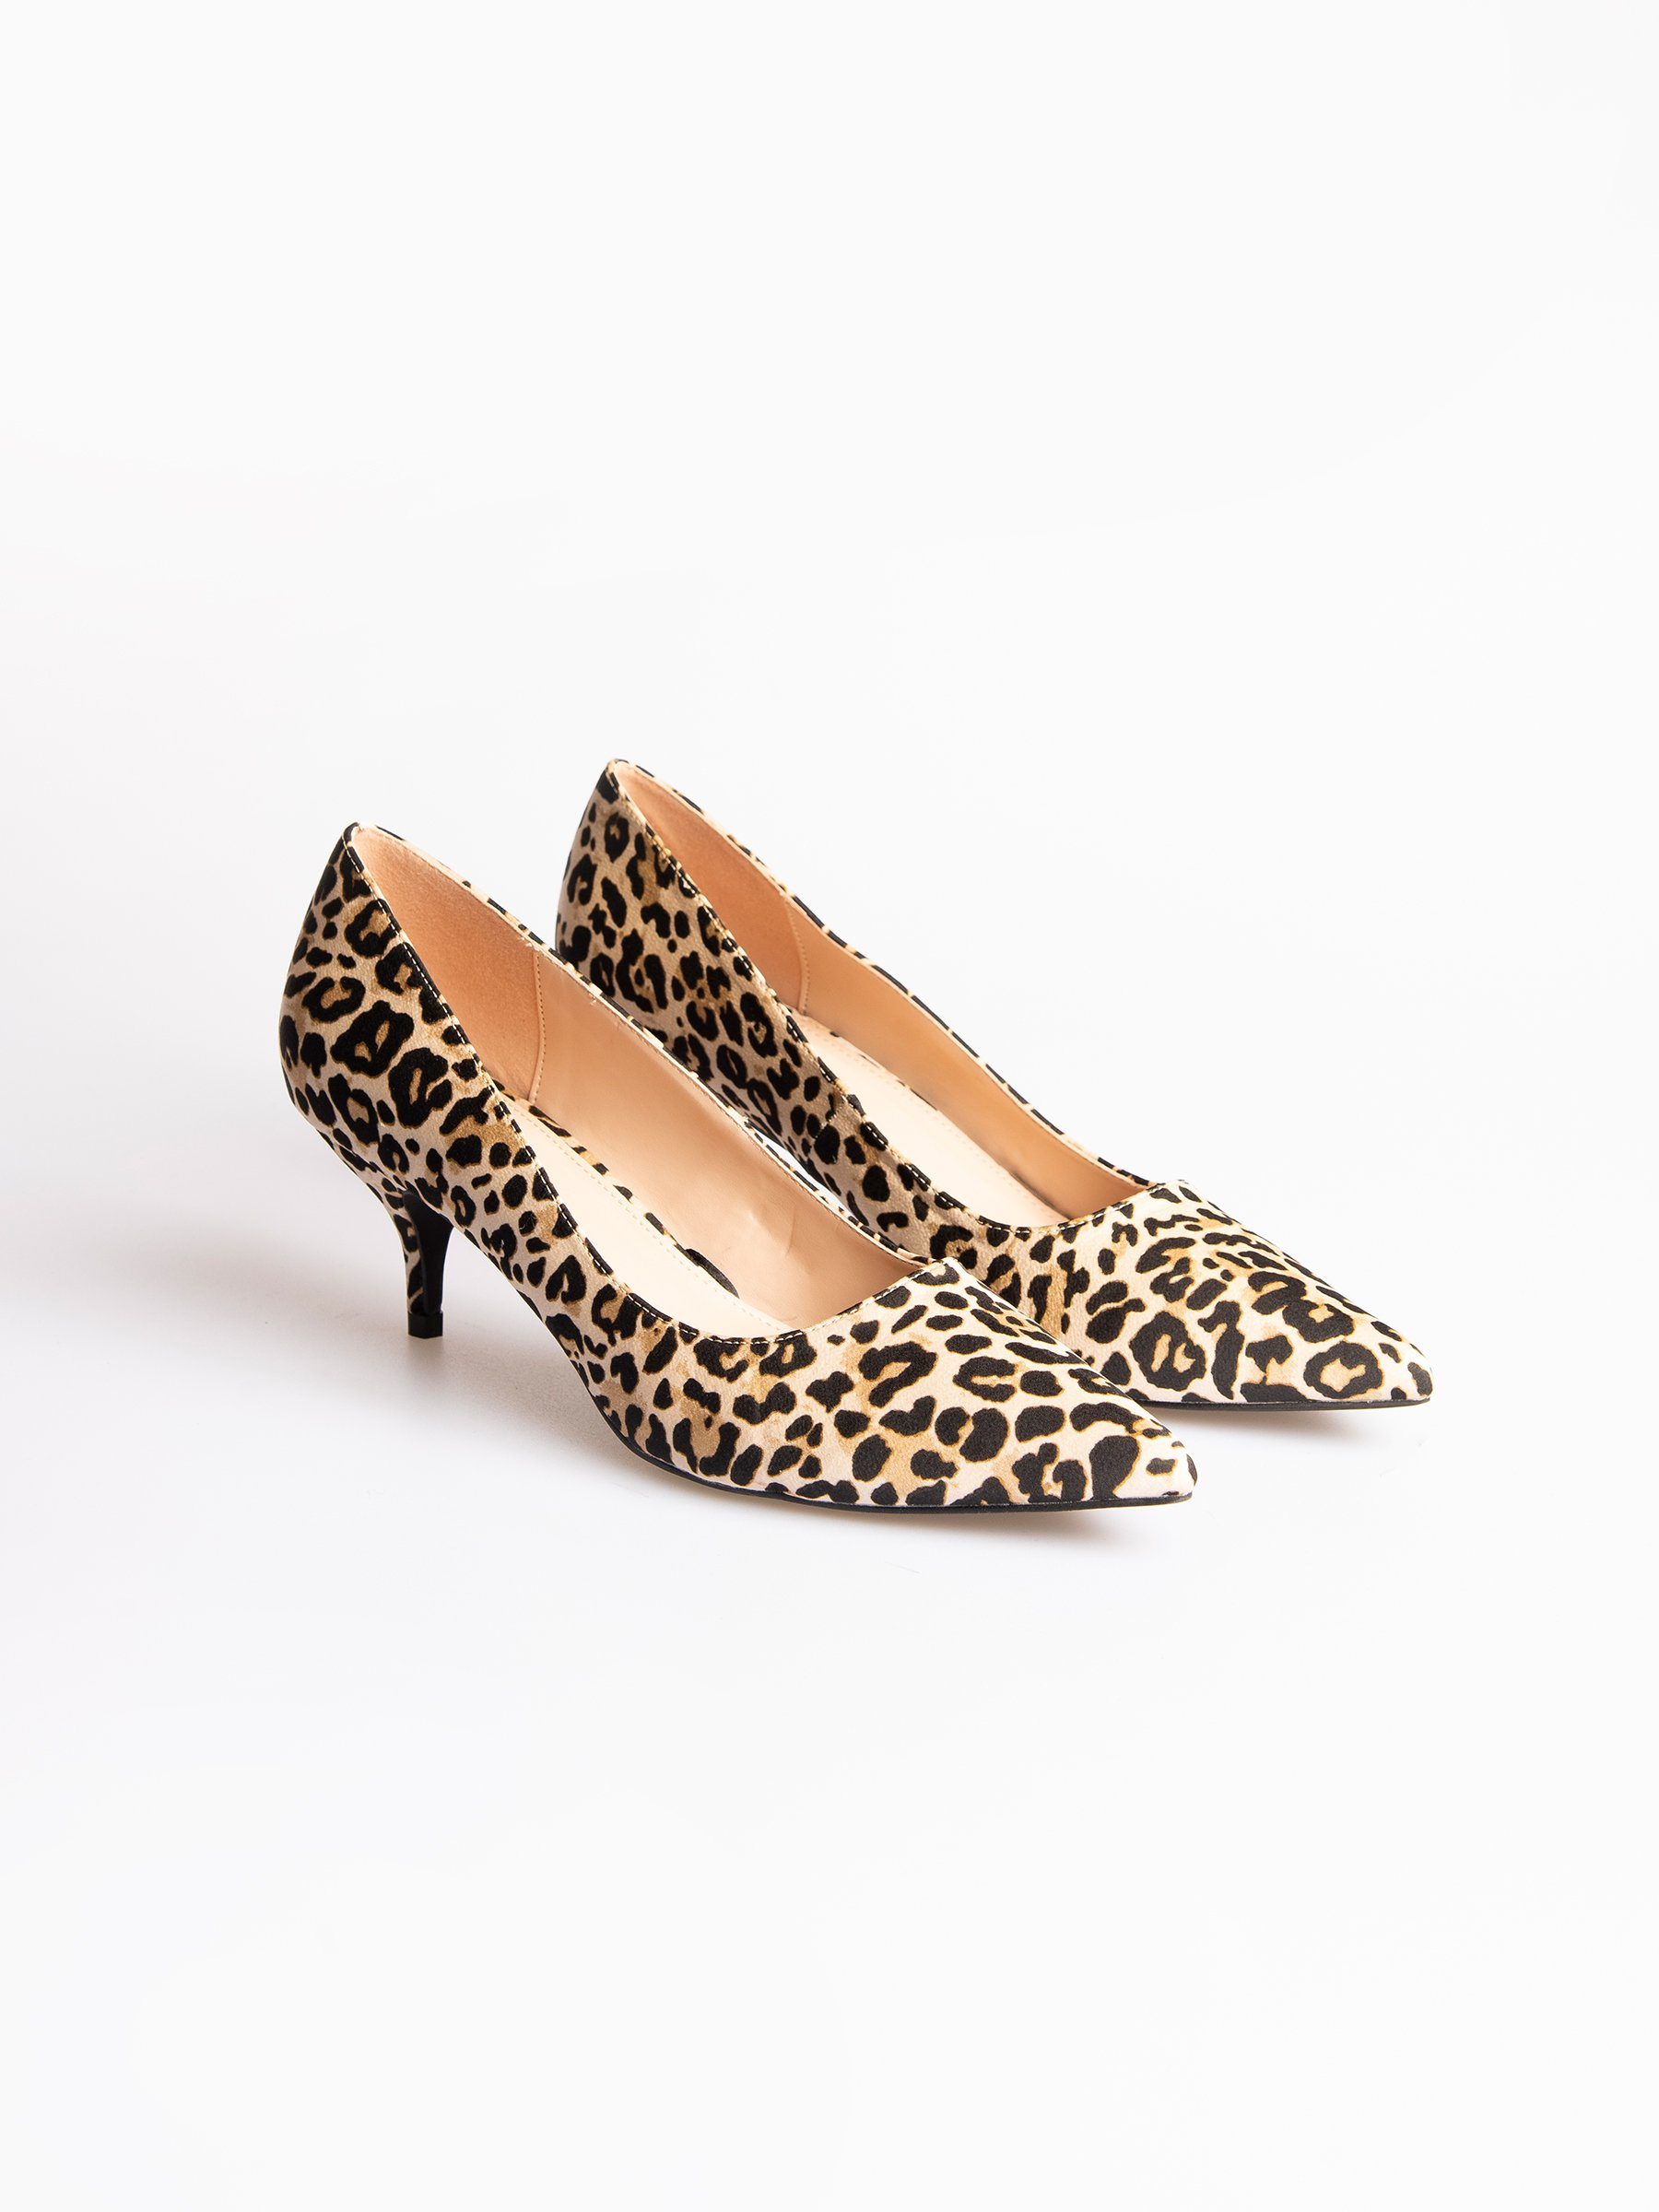 Mid heel pumps with animal print | GATE